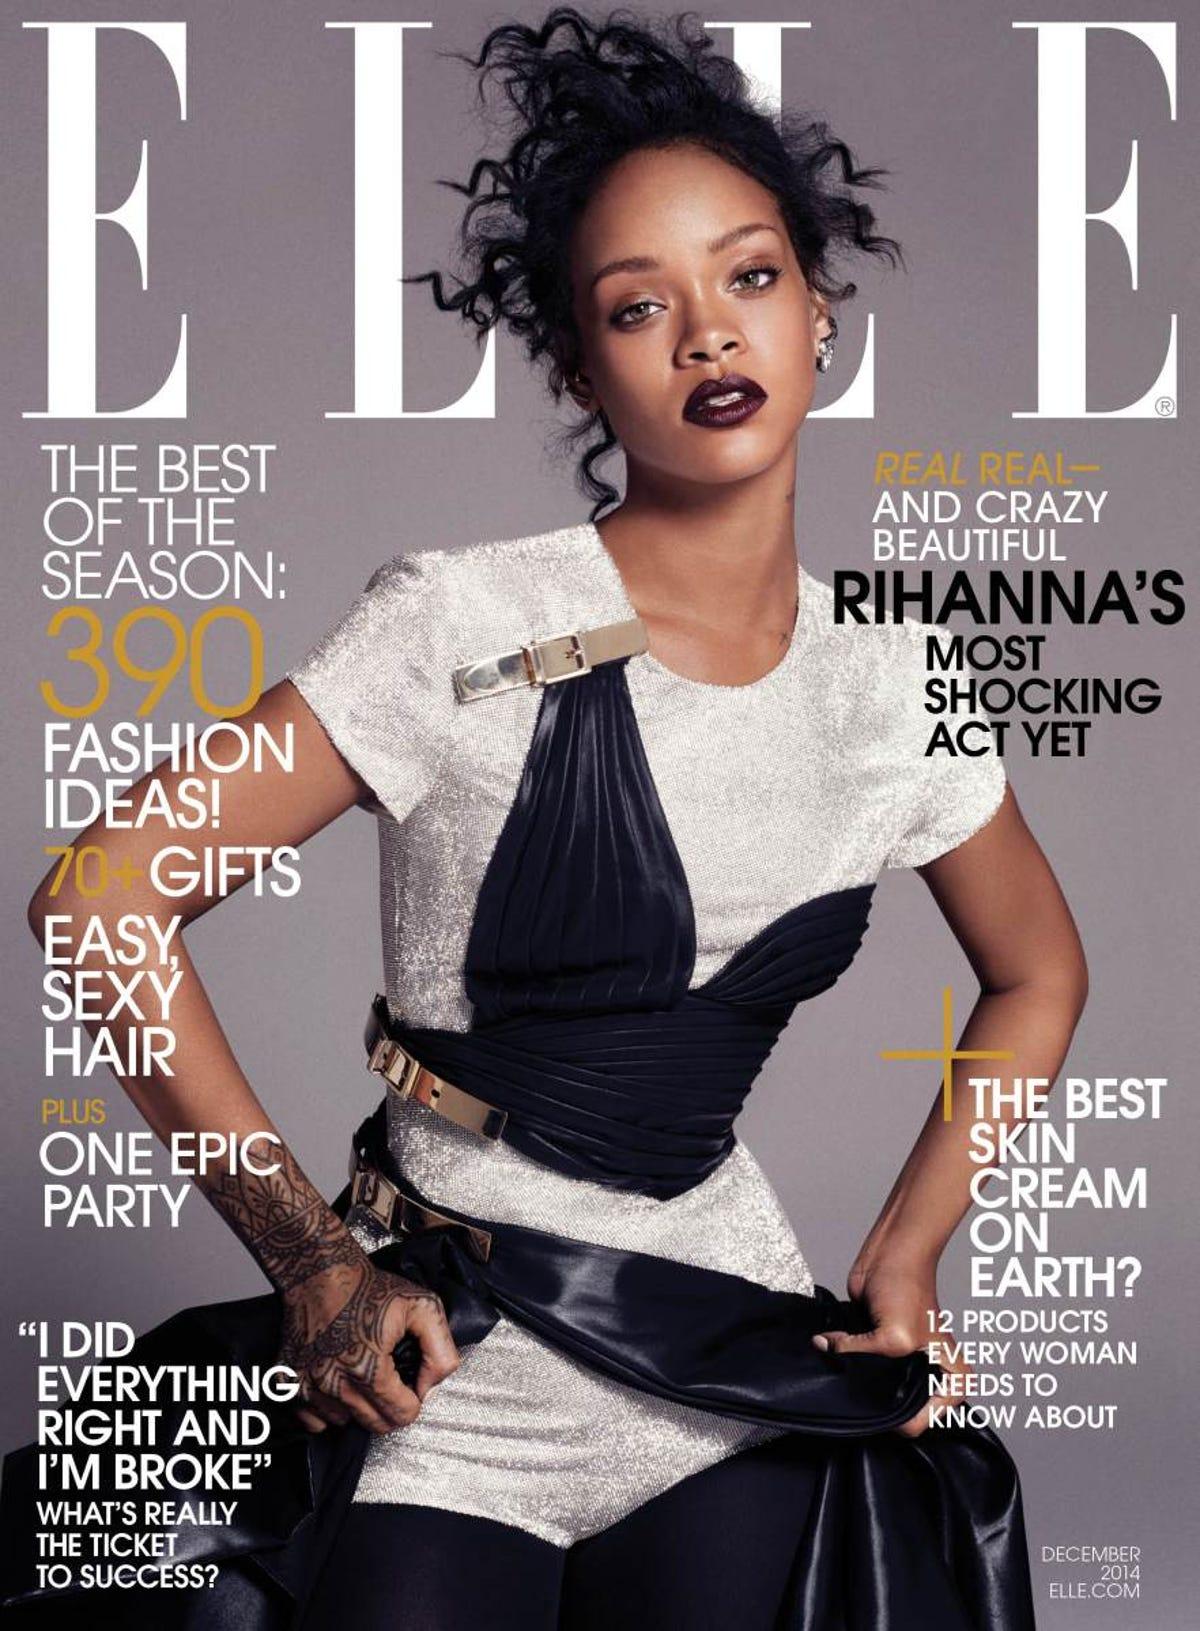 Rihanna's 'worst fear' involves a hospital, lots of drugs